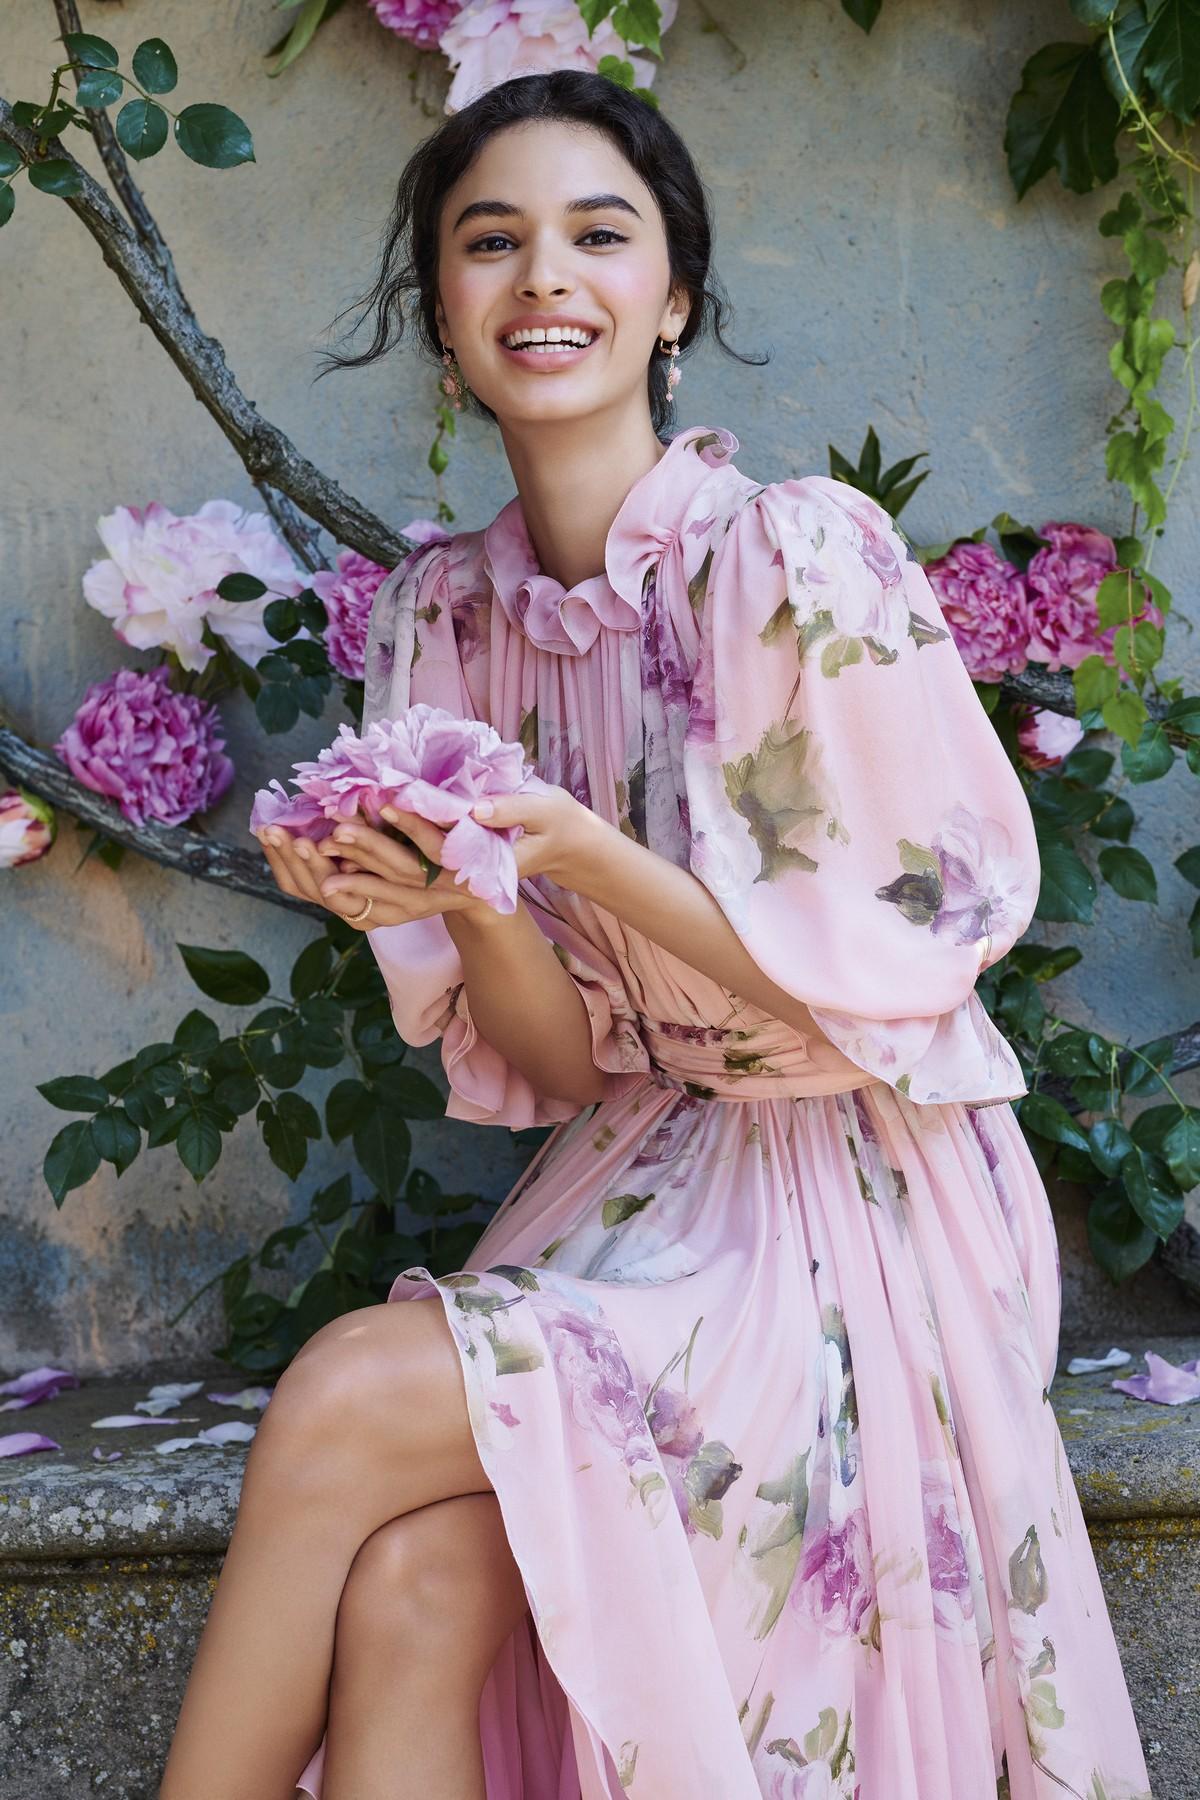 Dolce&Gabbana make up primavera 2019